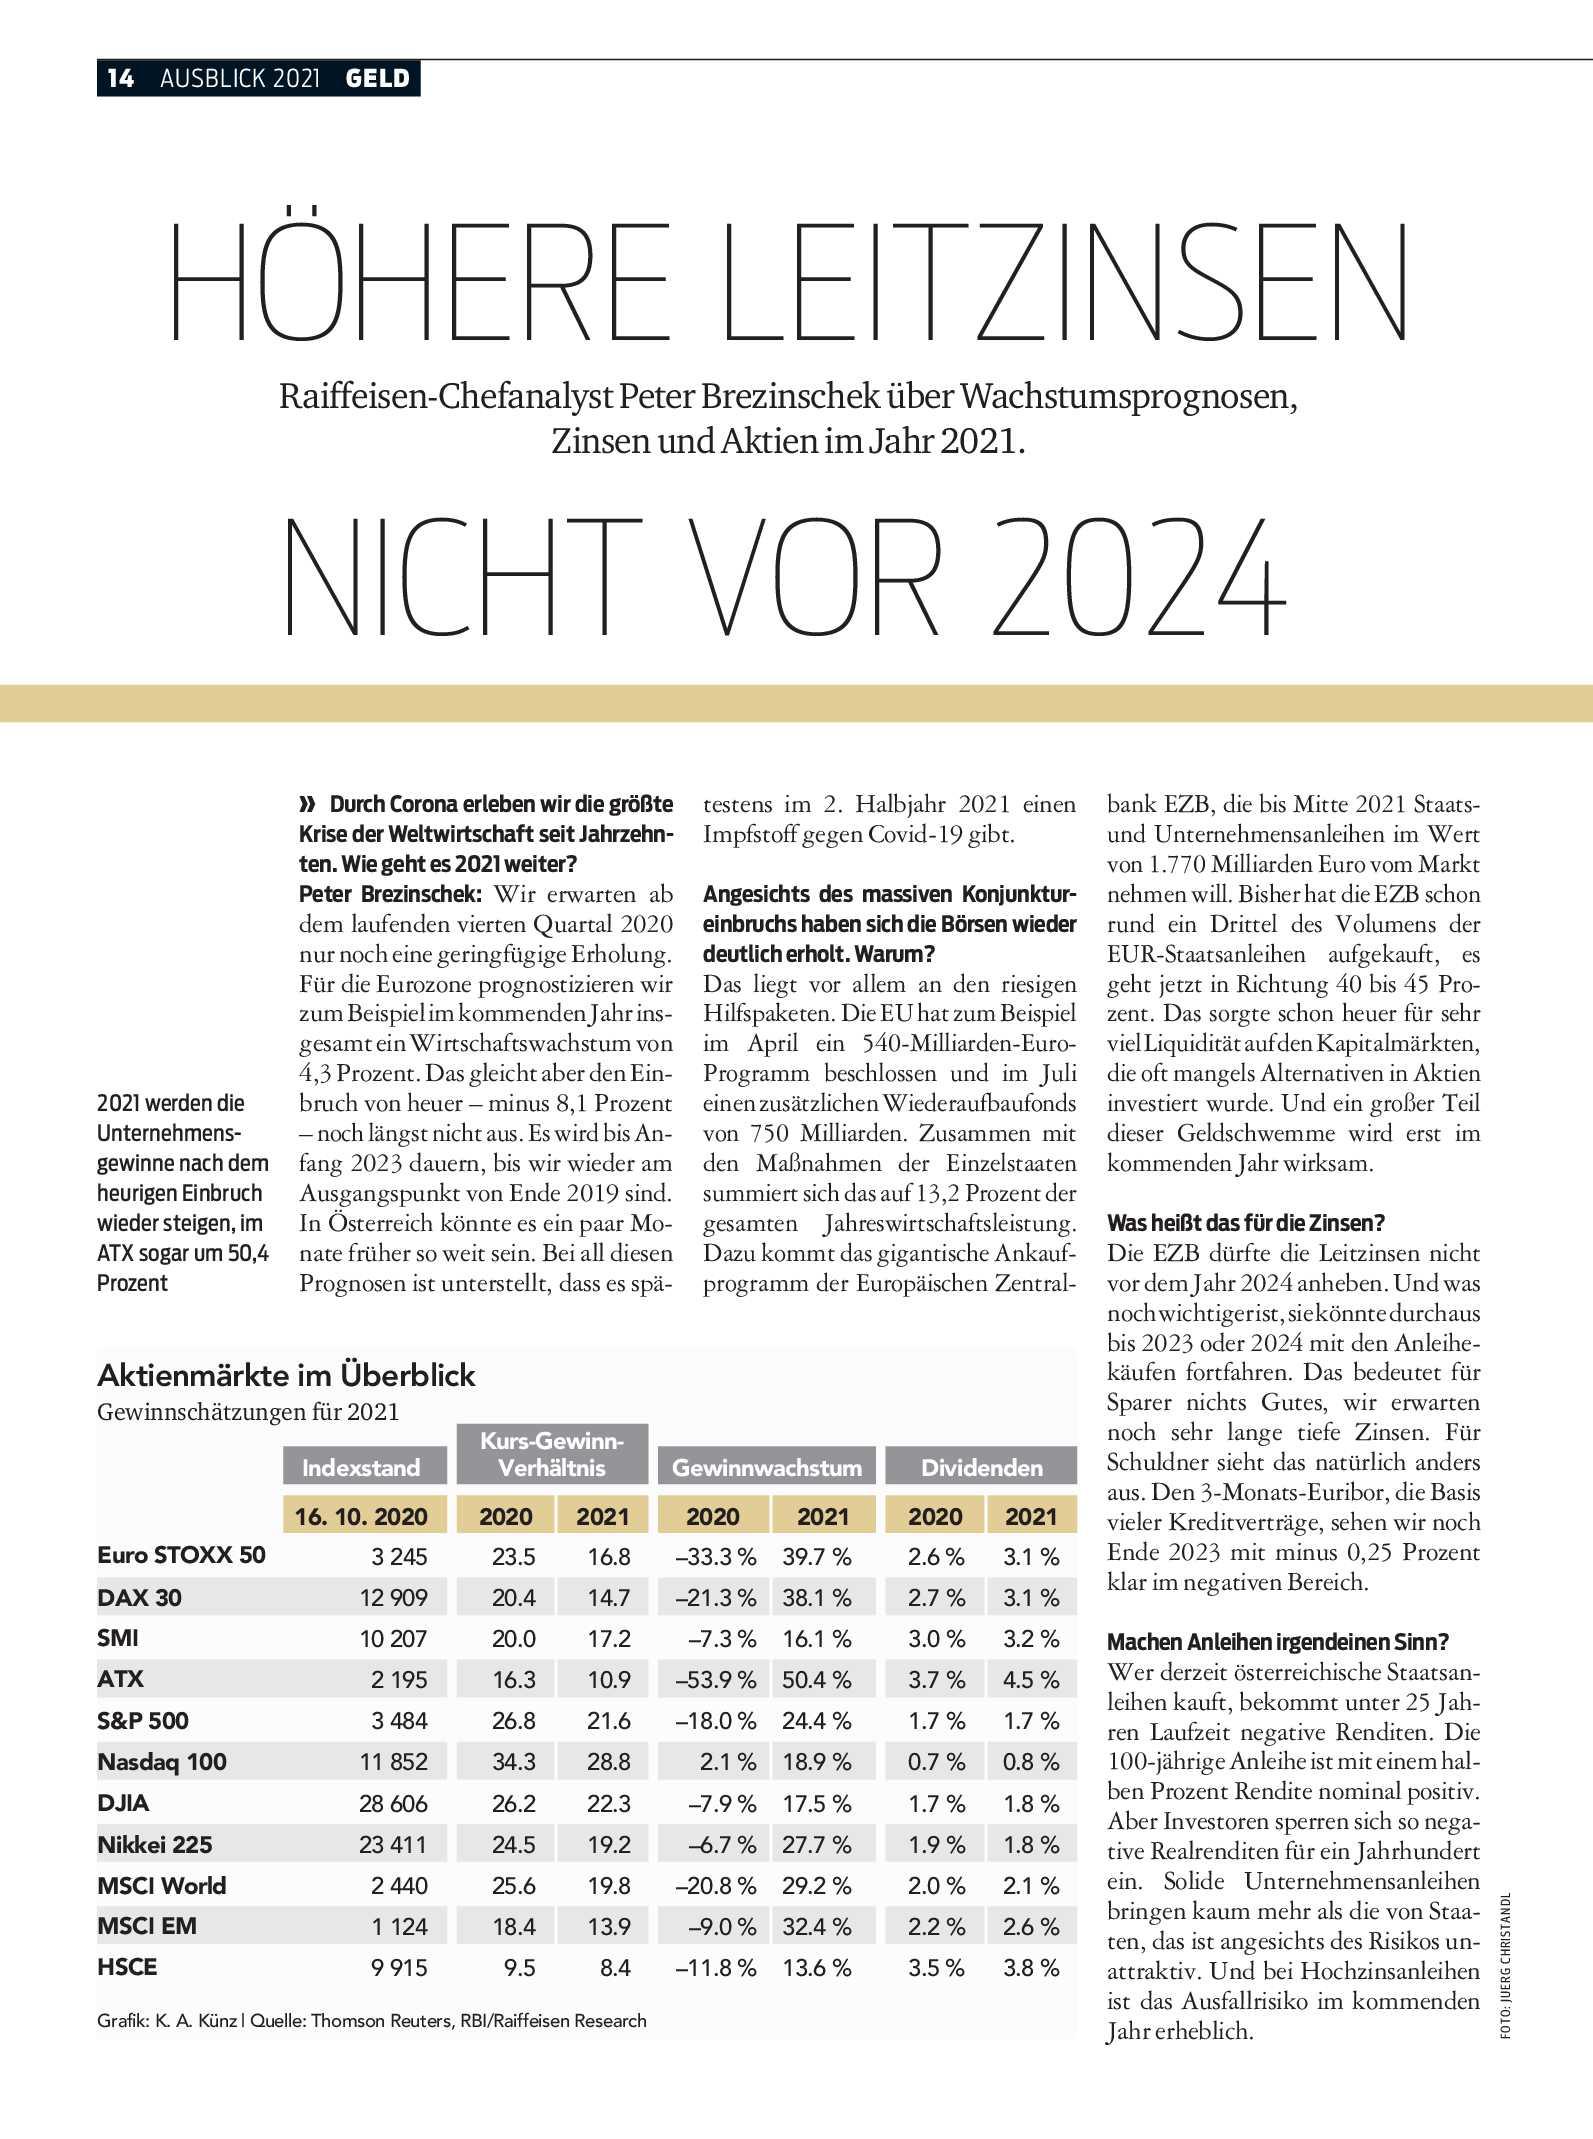 public/epaper/imported/20201118/kurier/magazin/magazin_20201118_014.jpg